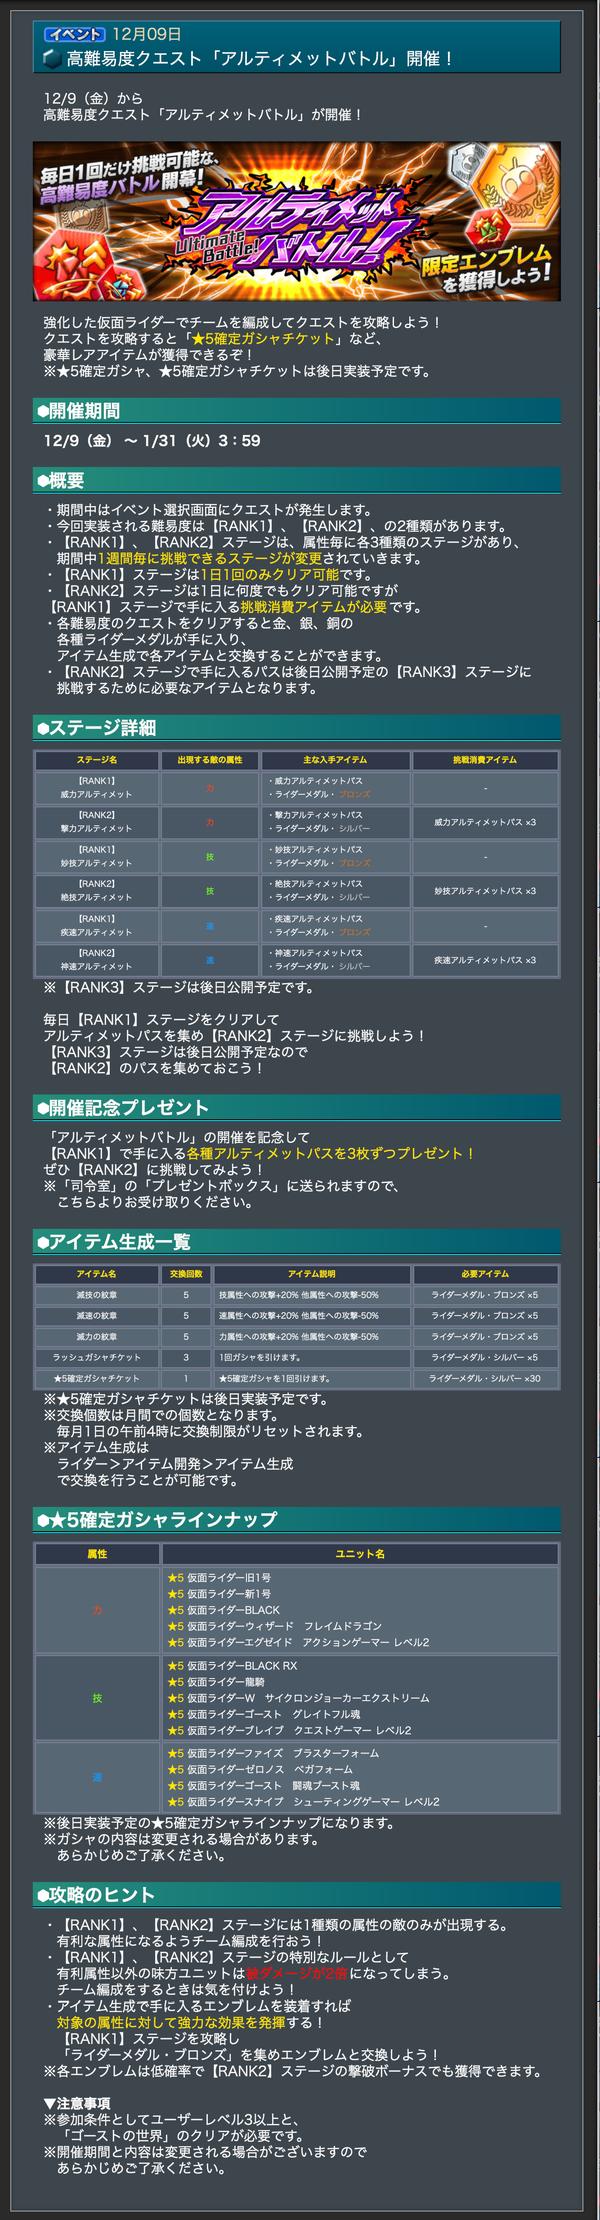 f:id:ich-ichi:20161212165743p:plain